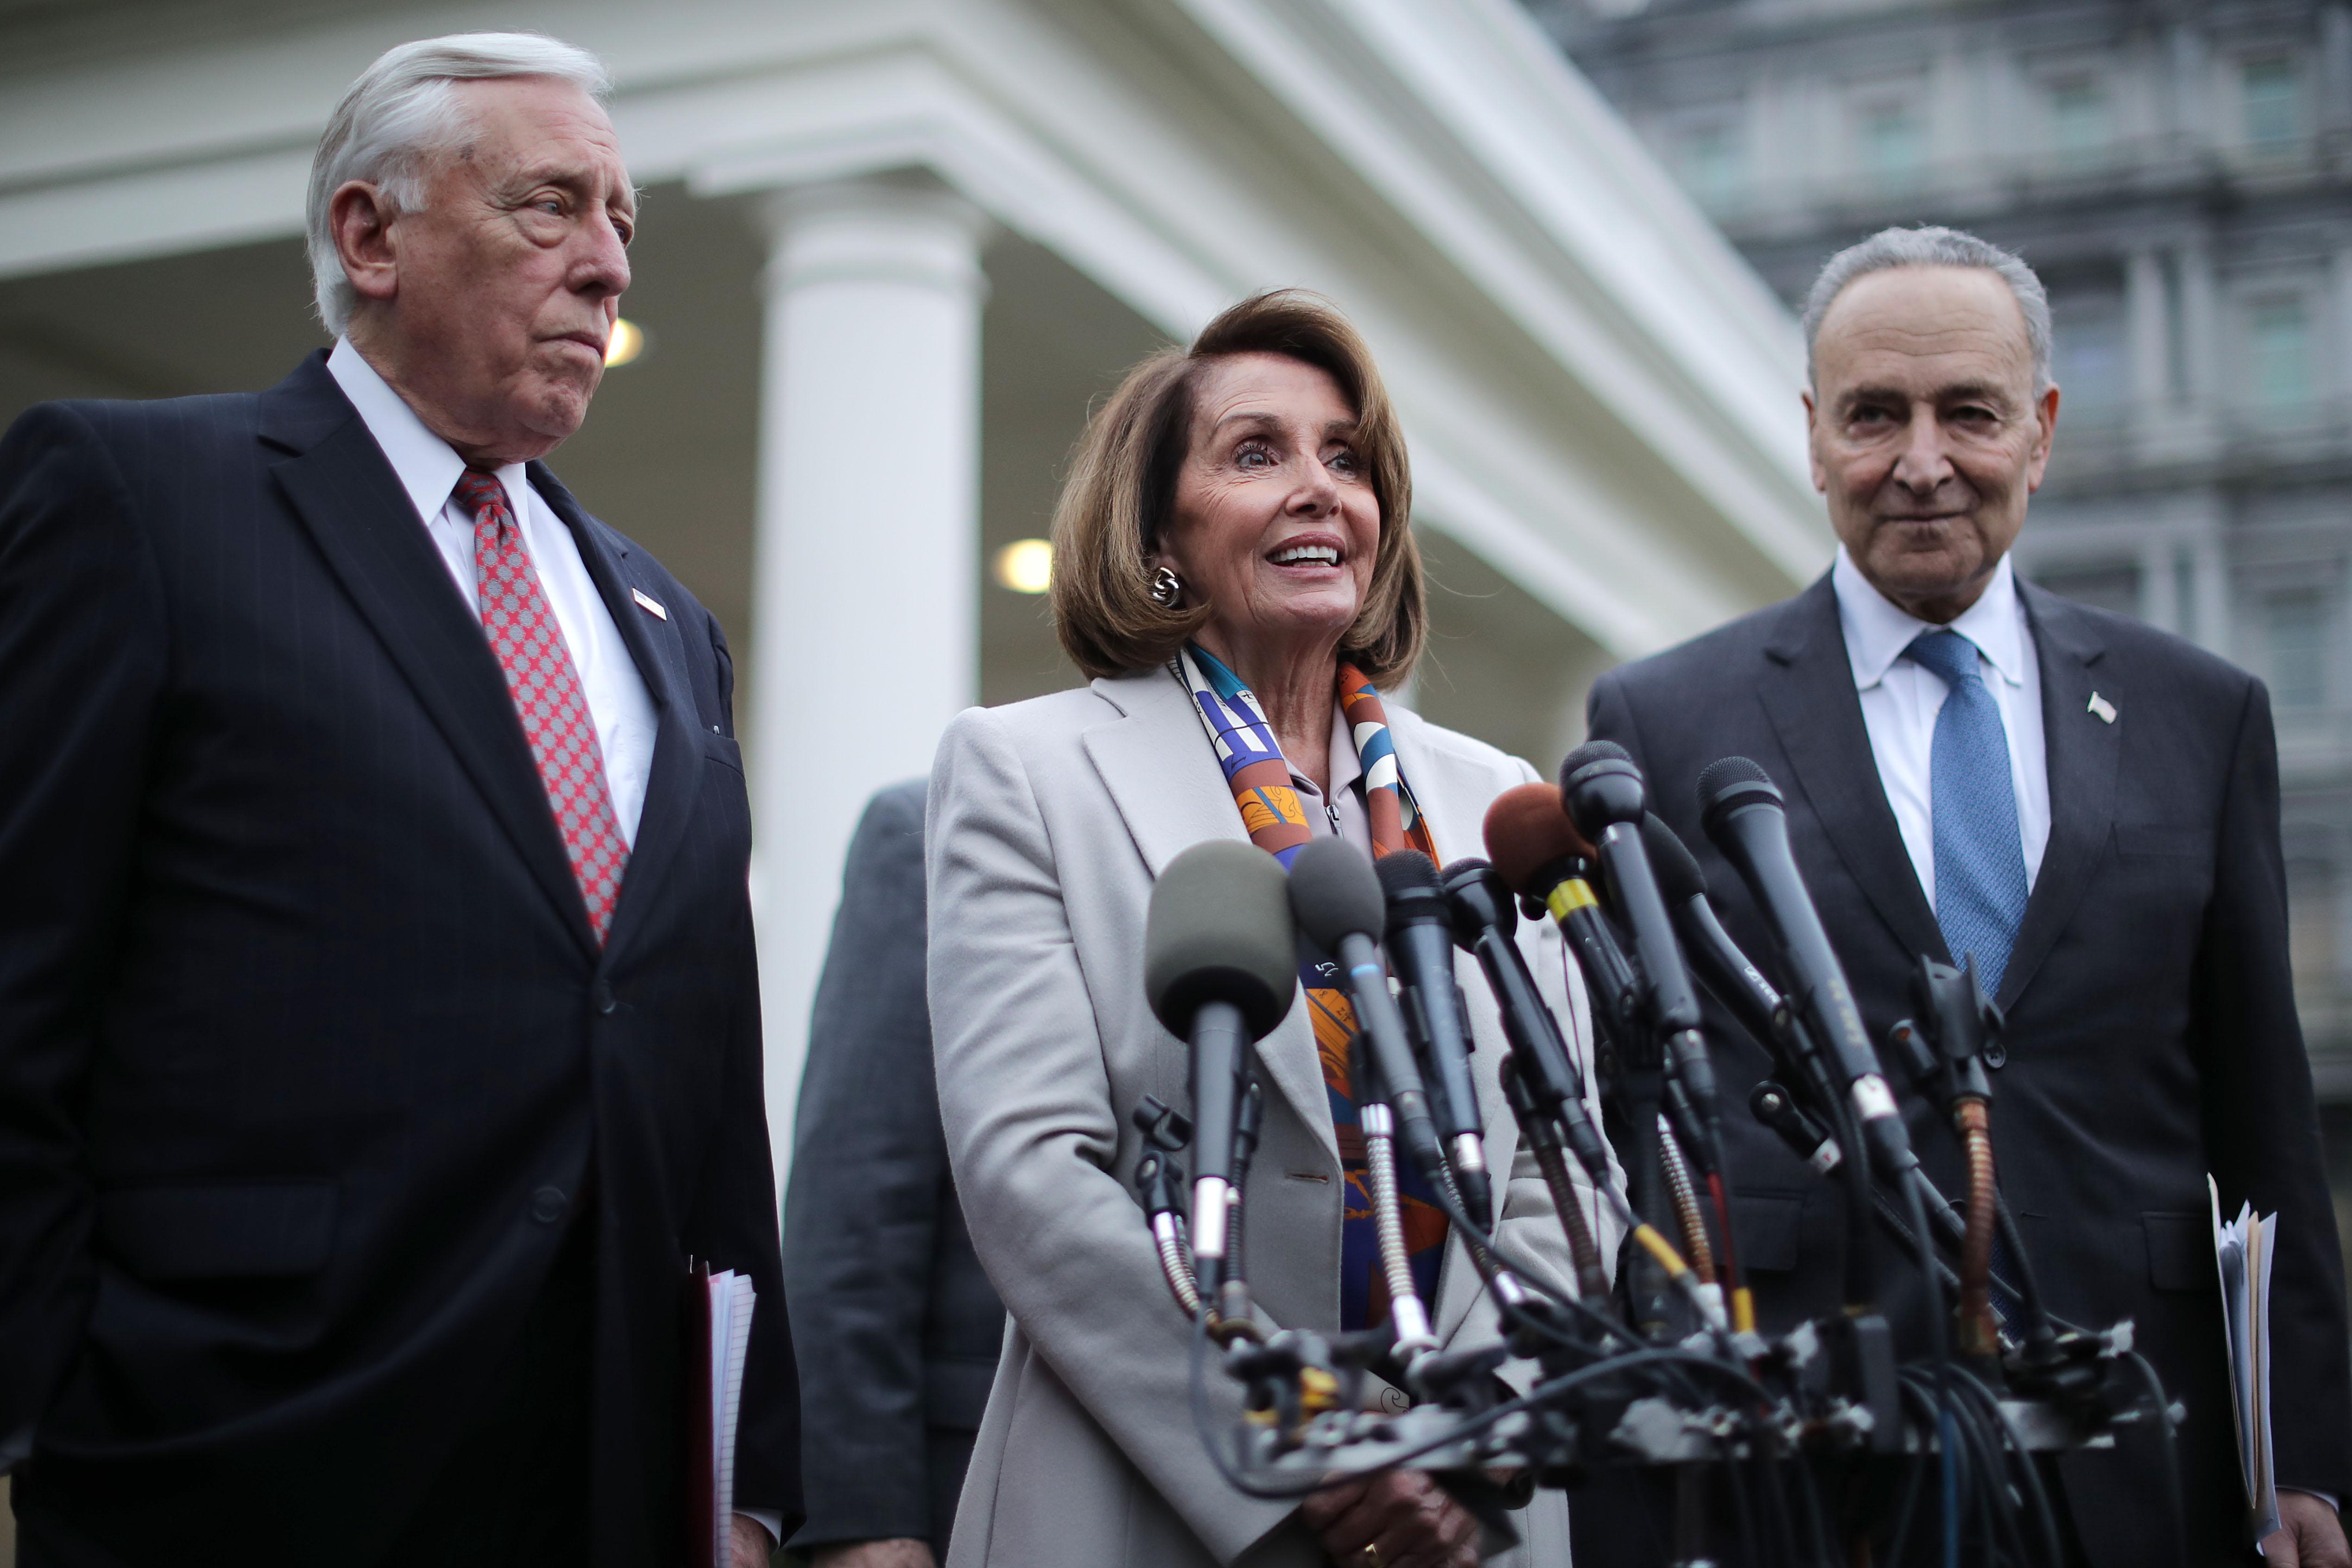 House Minority Whip Steny Hoyer, House Speaker designate Nancy Pelosi and Senate Minority Leader Charles Schumer talk to journalists (Chip Somodevilla/Getty Images)